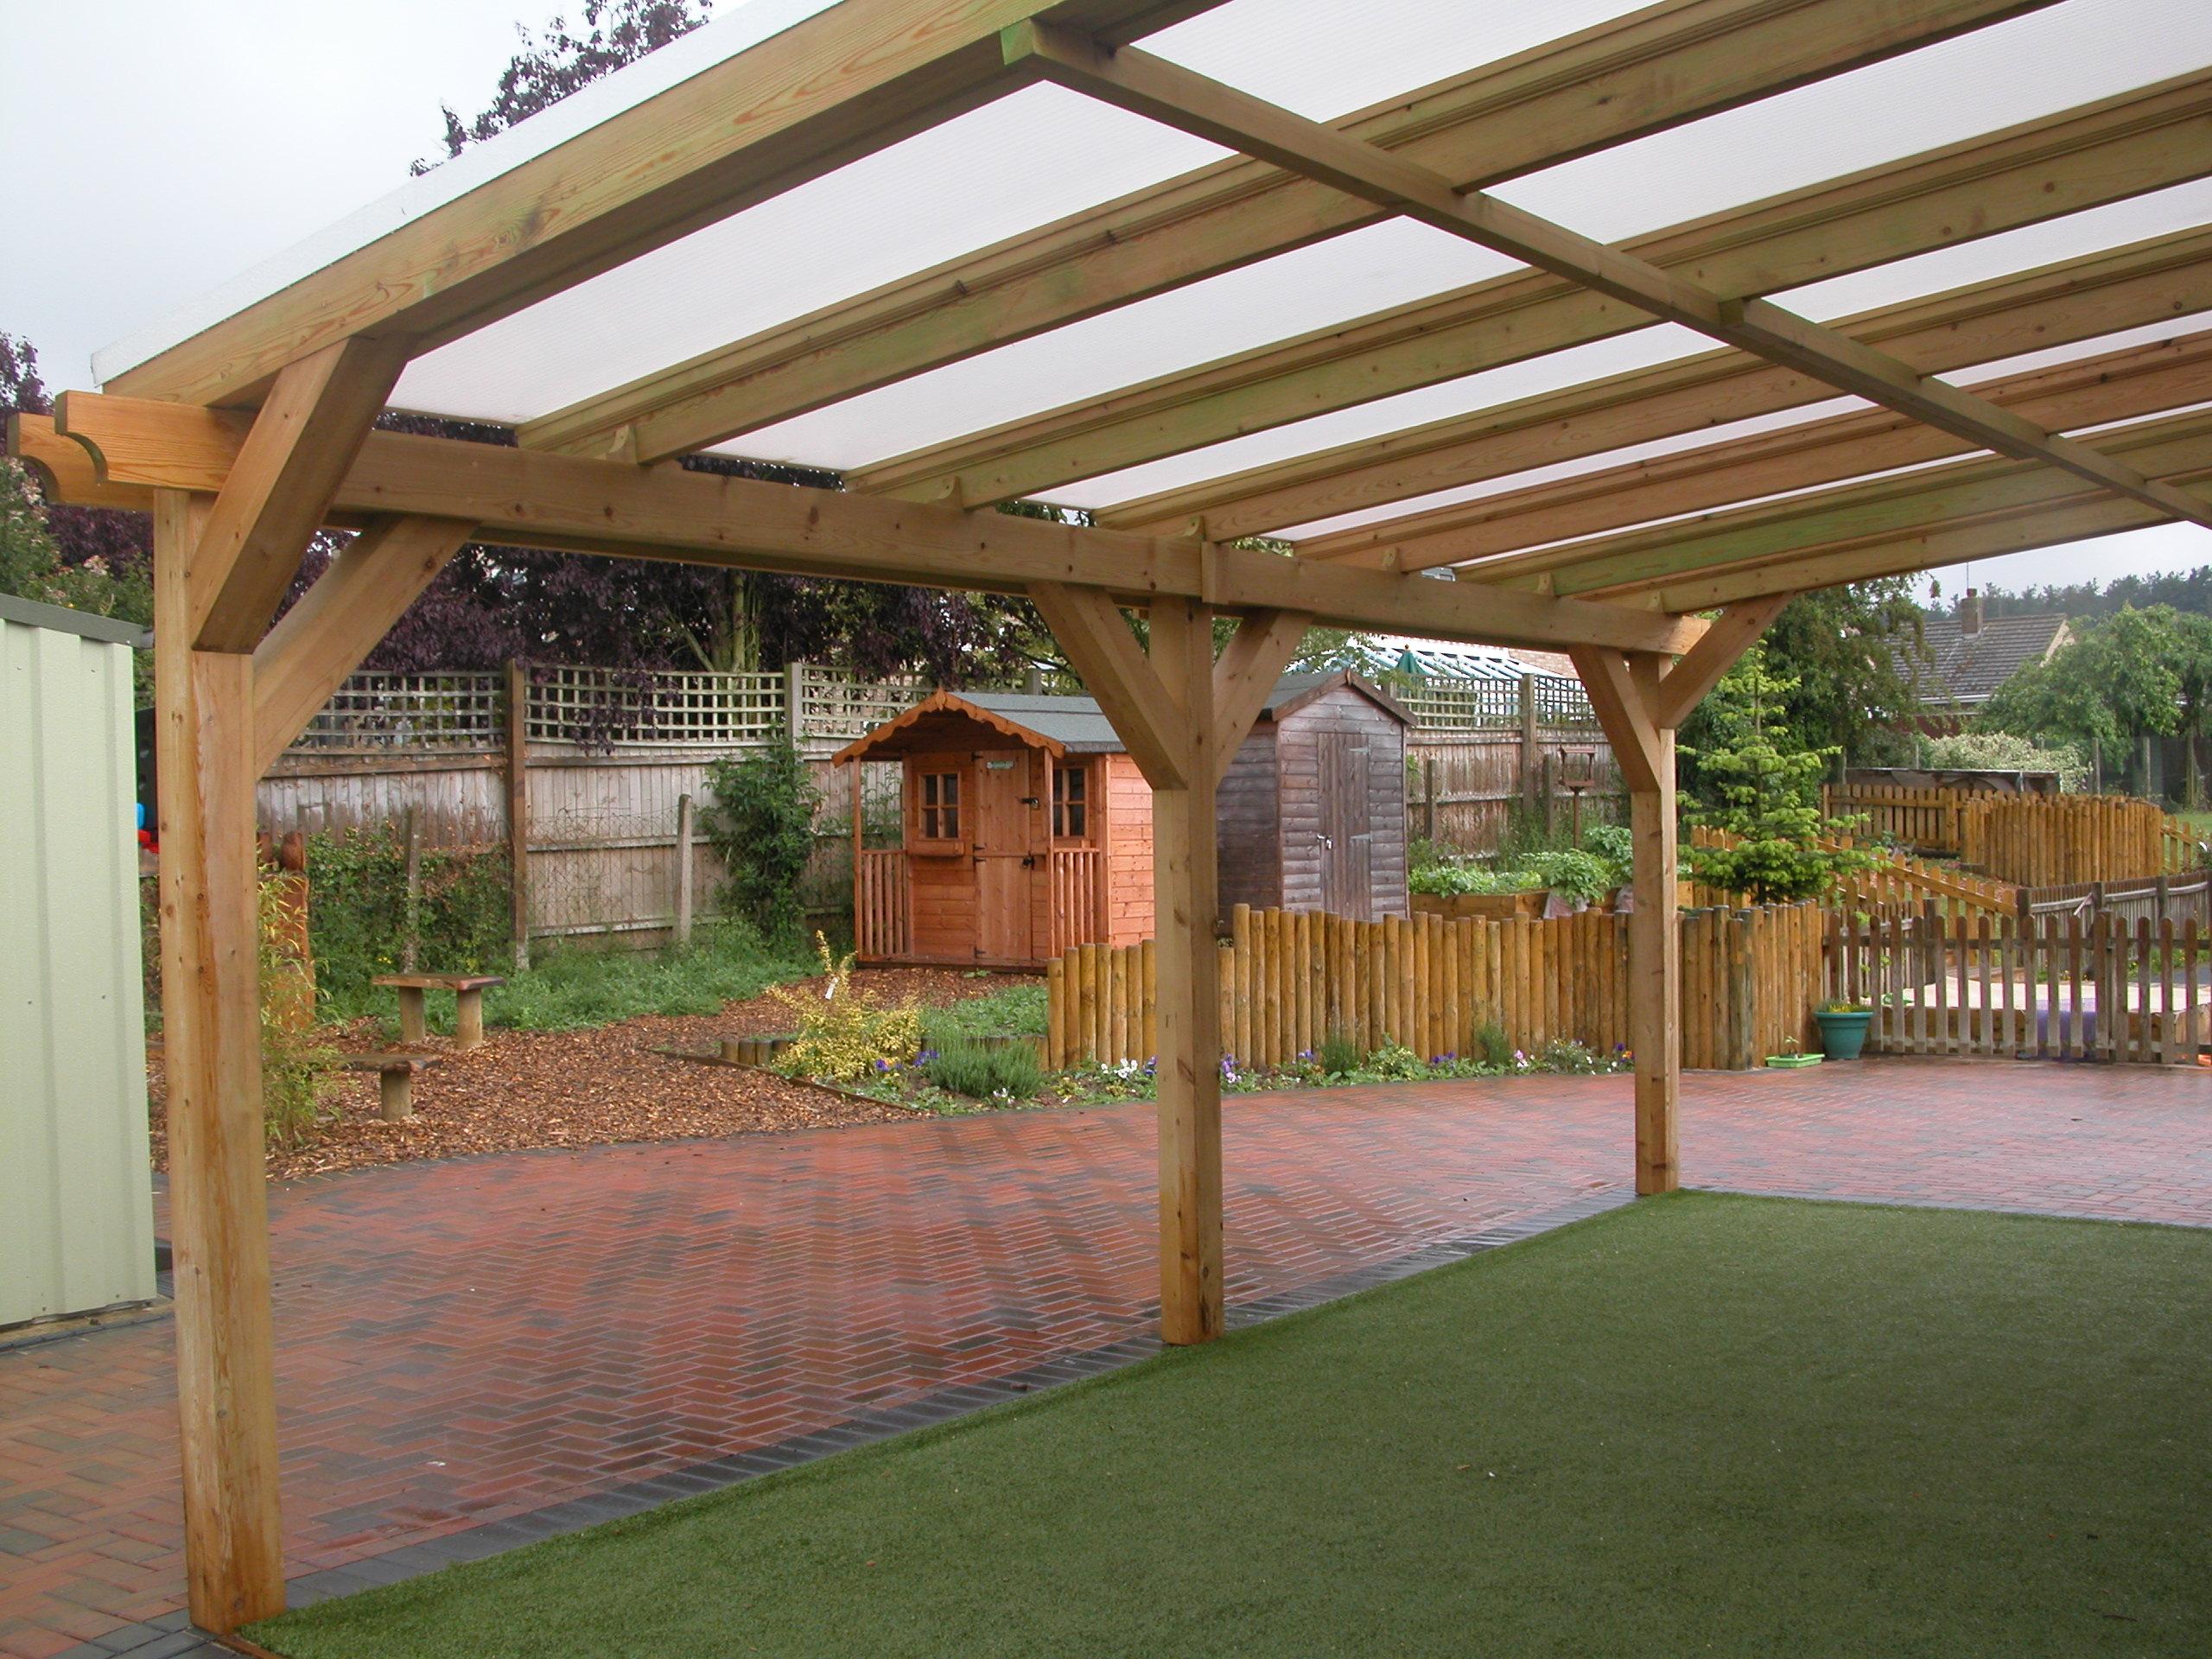 Wooden Outdoor | Lock-it Safe